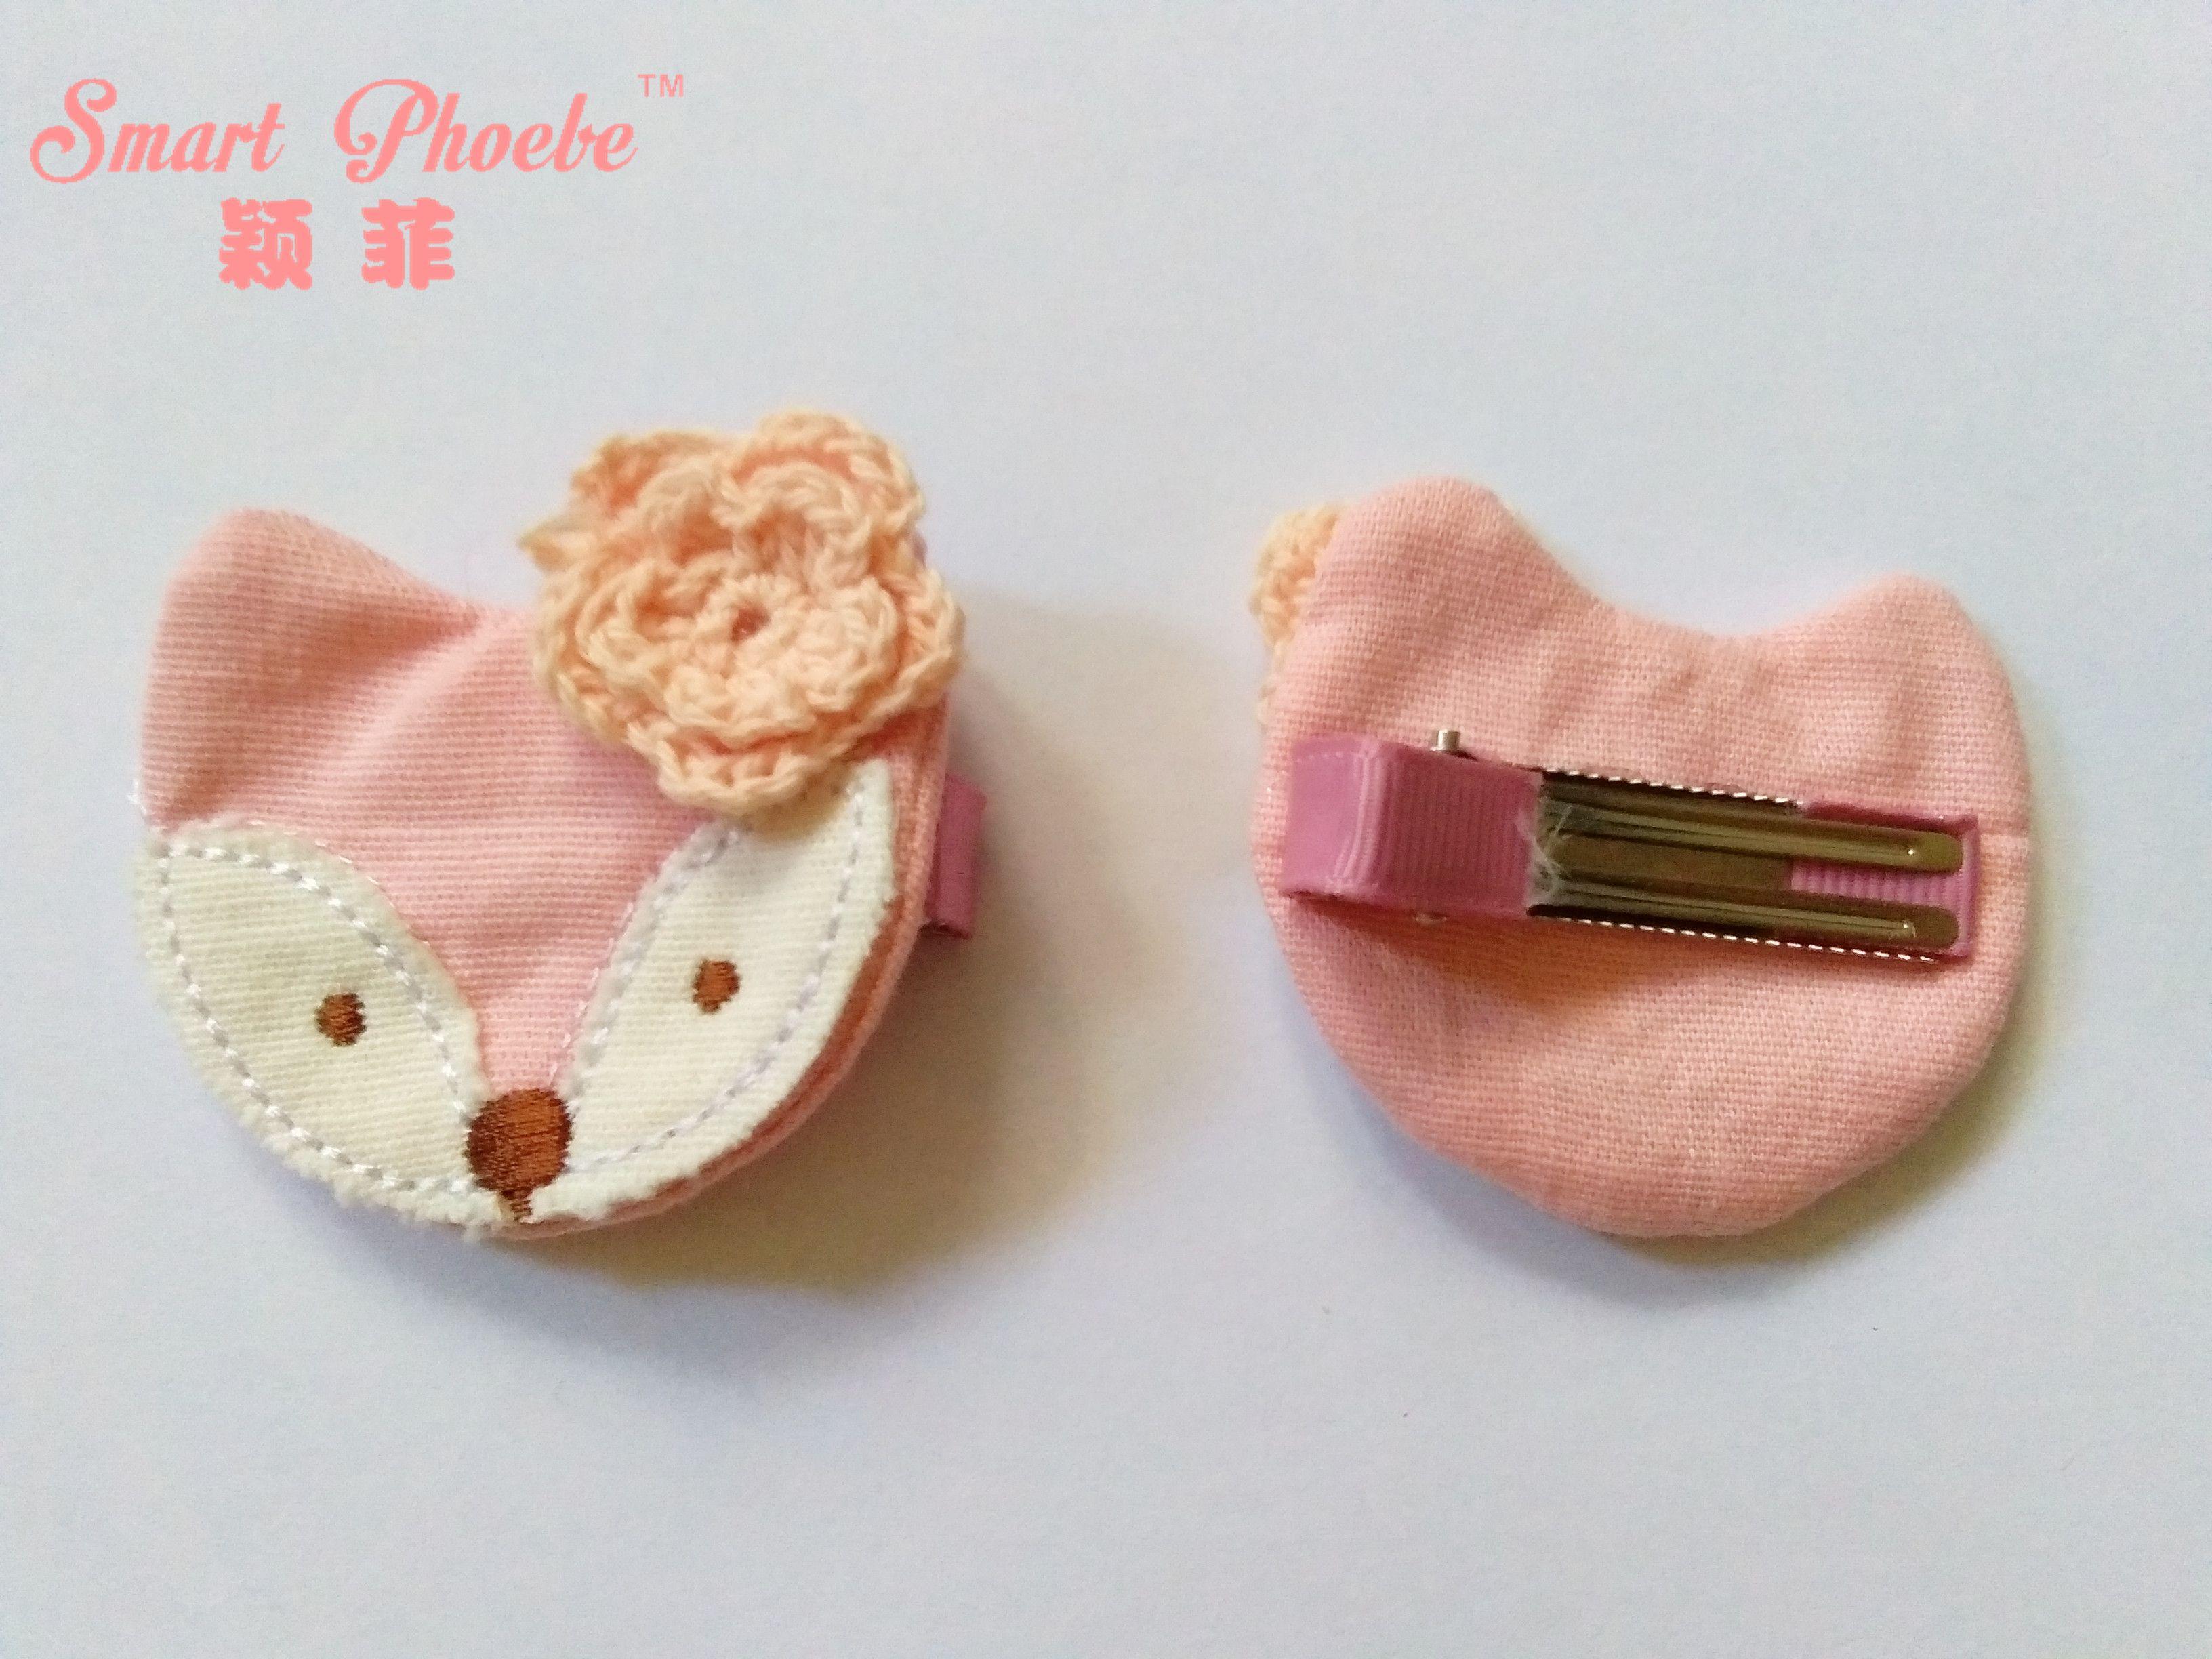 Boutique por atacado Moda Bonito Dos Desenhos Animados Raposa com Floral Meninas Grampos de Cabelo Sólido Animal Do Bebê Meninas Grampos de Cabelo